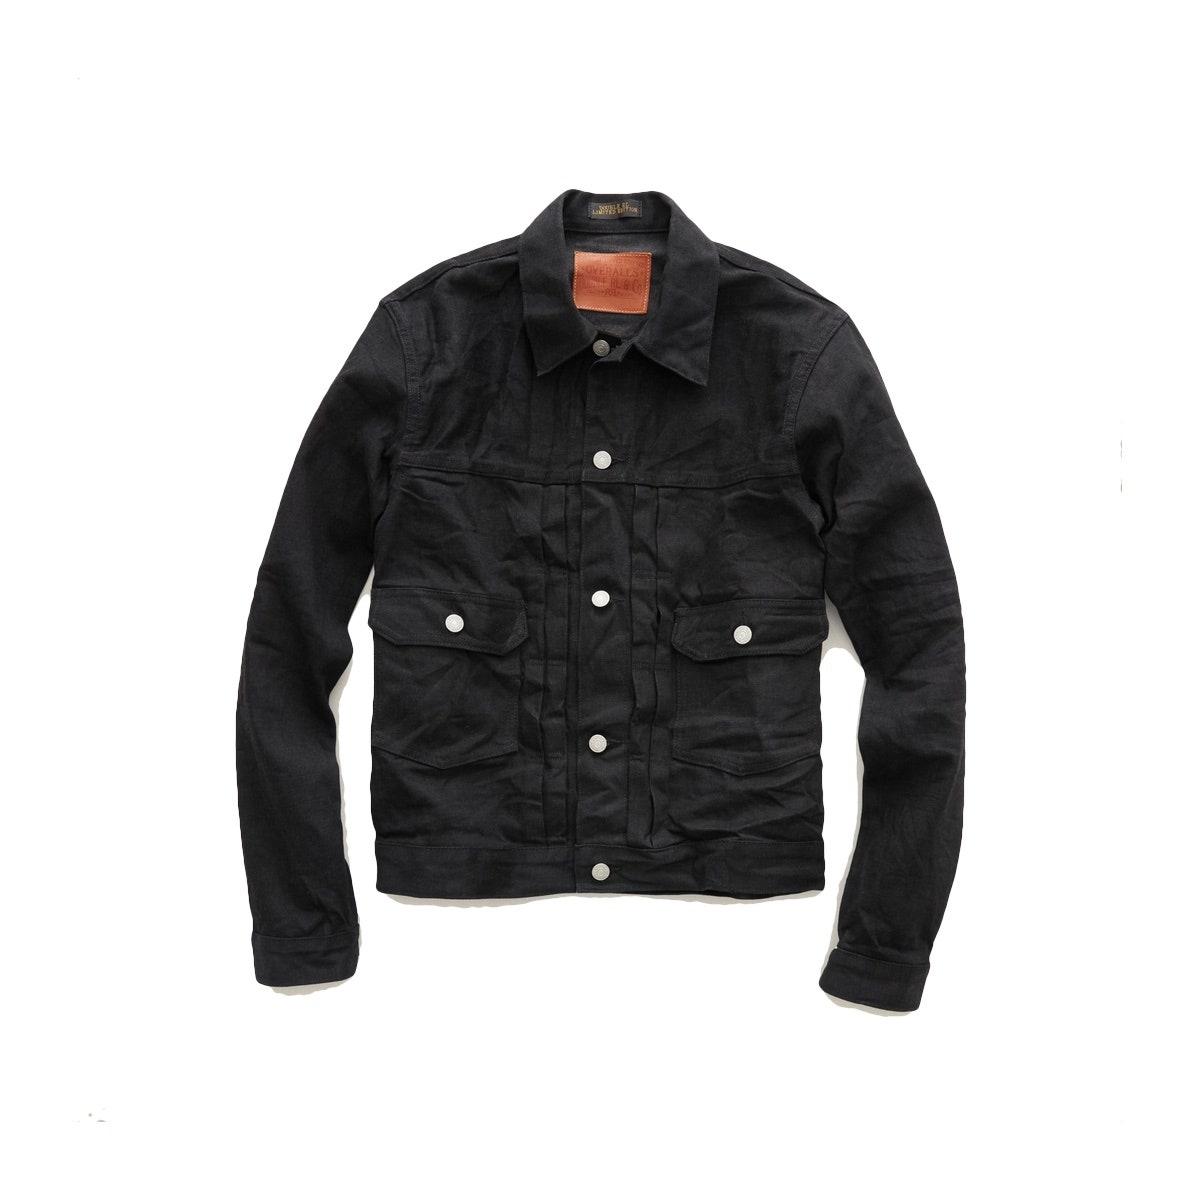 02-ralph-lauren-denim-jacket-gq.jpg